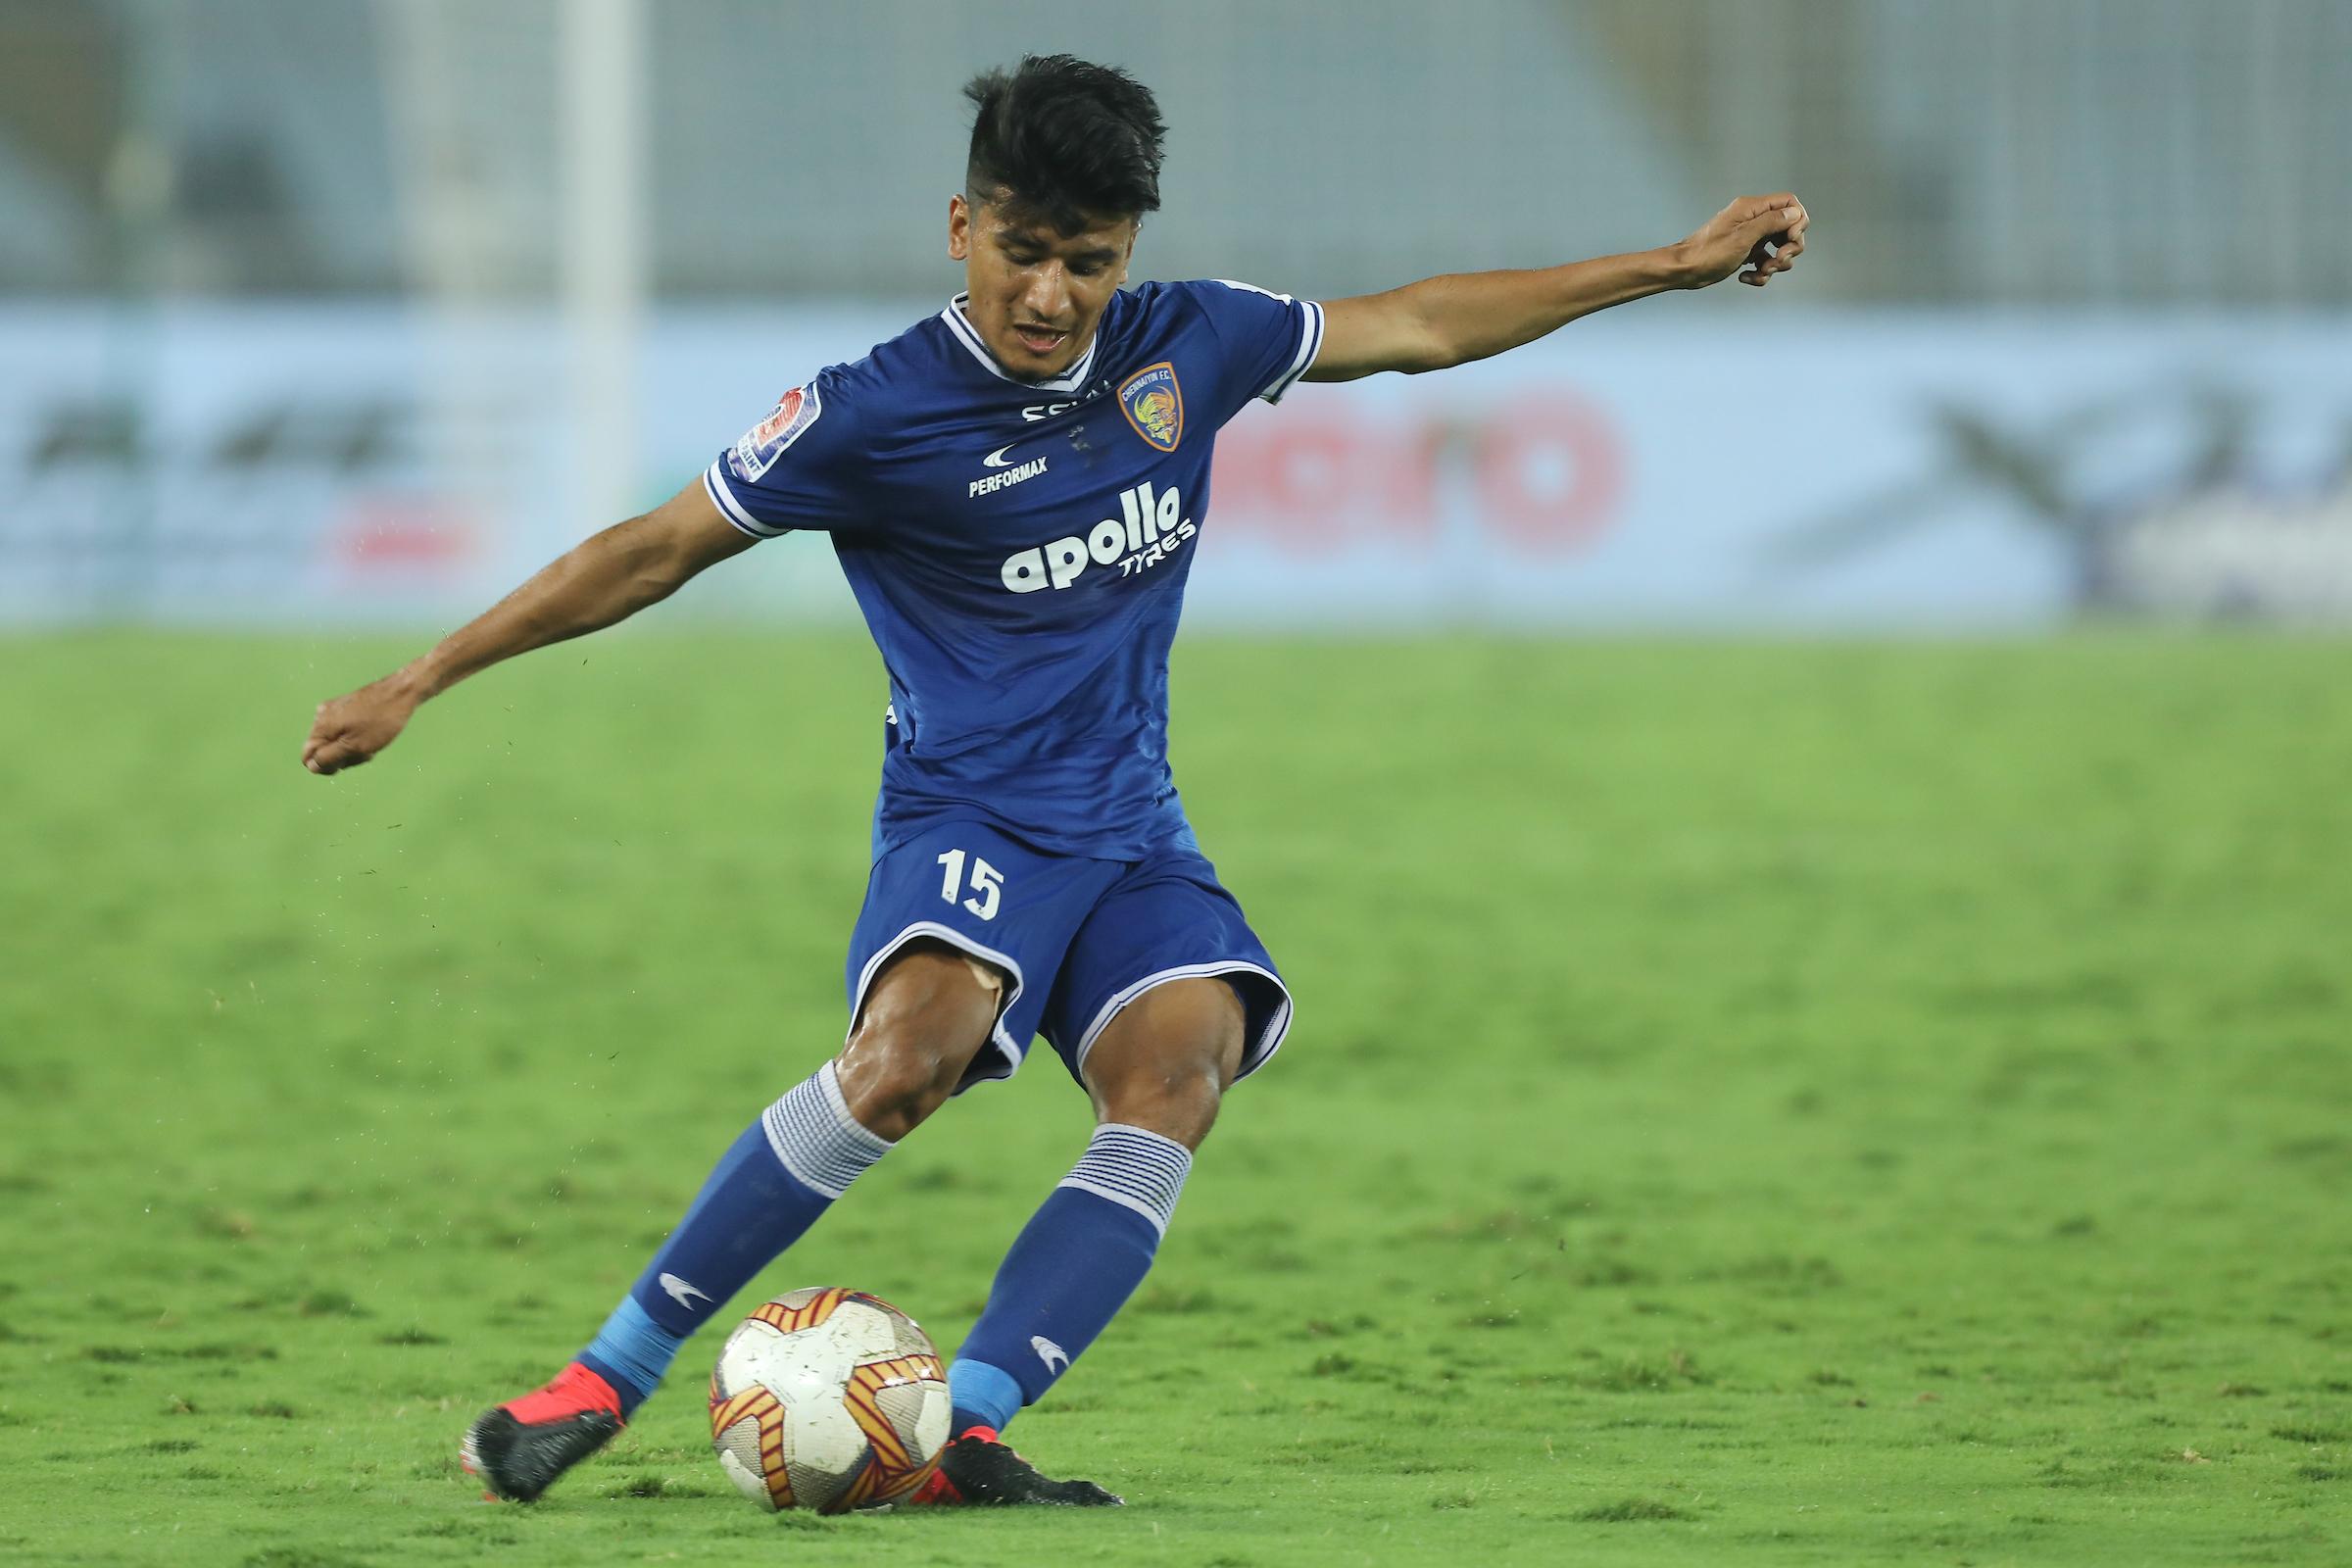 'From a precocious talent to a team leader' - Chennaiyin FC's Anirudh Thapa raring to go after a tough pre-season!